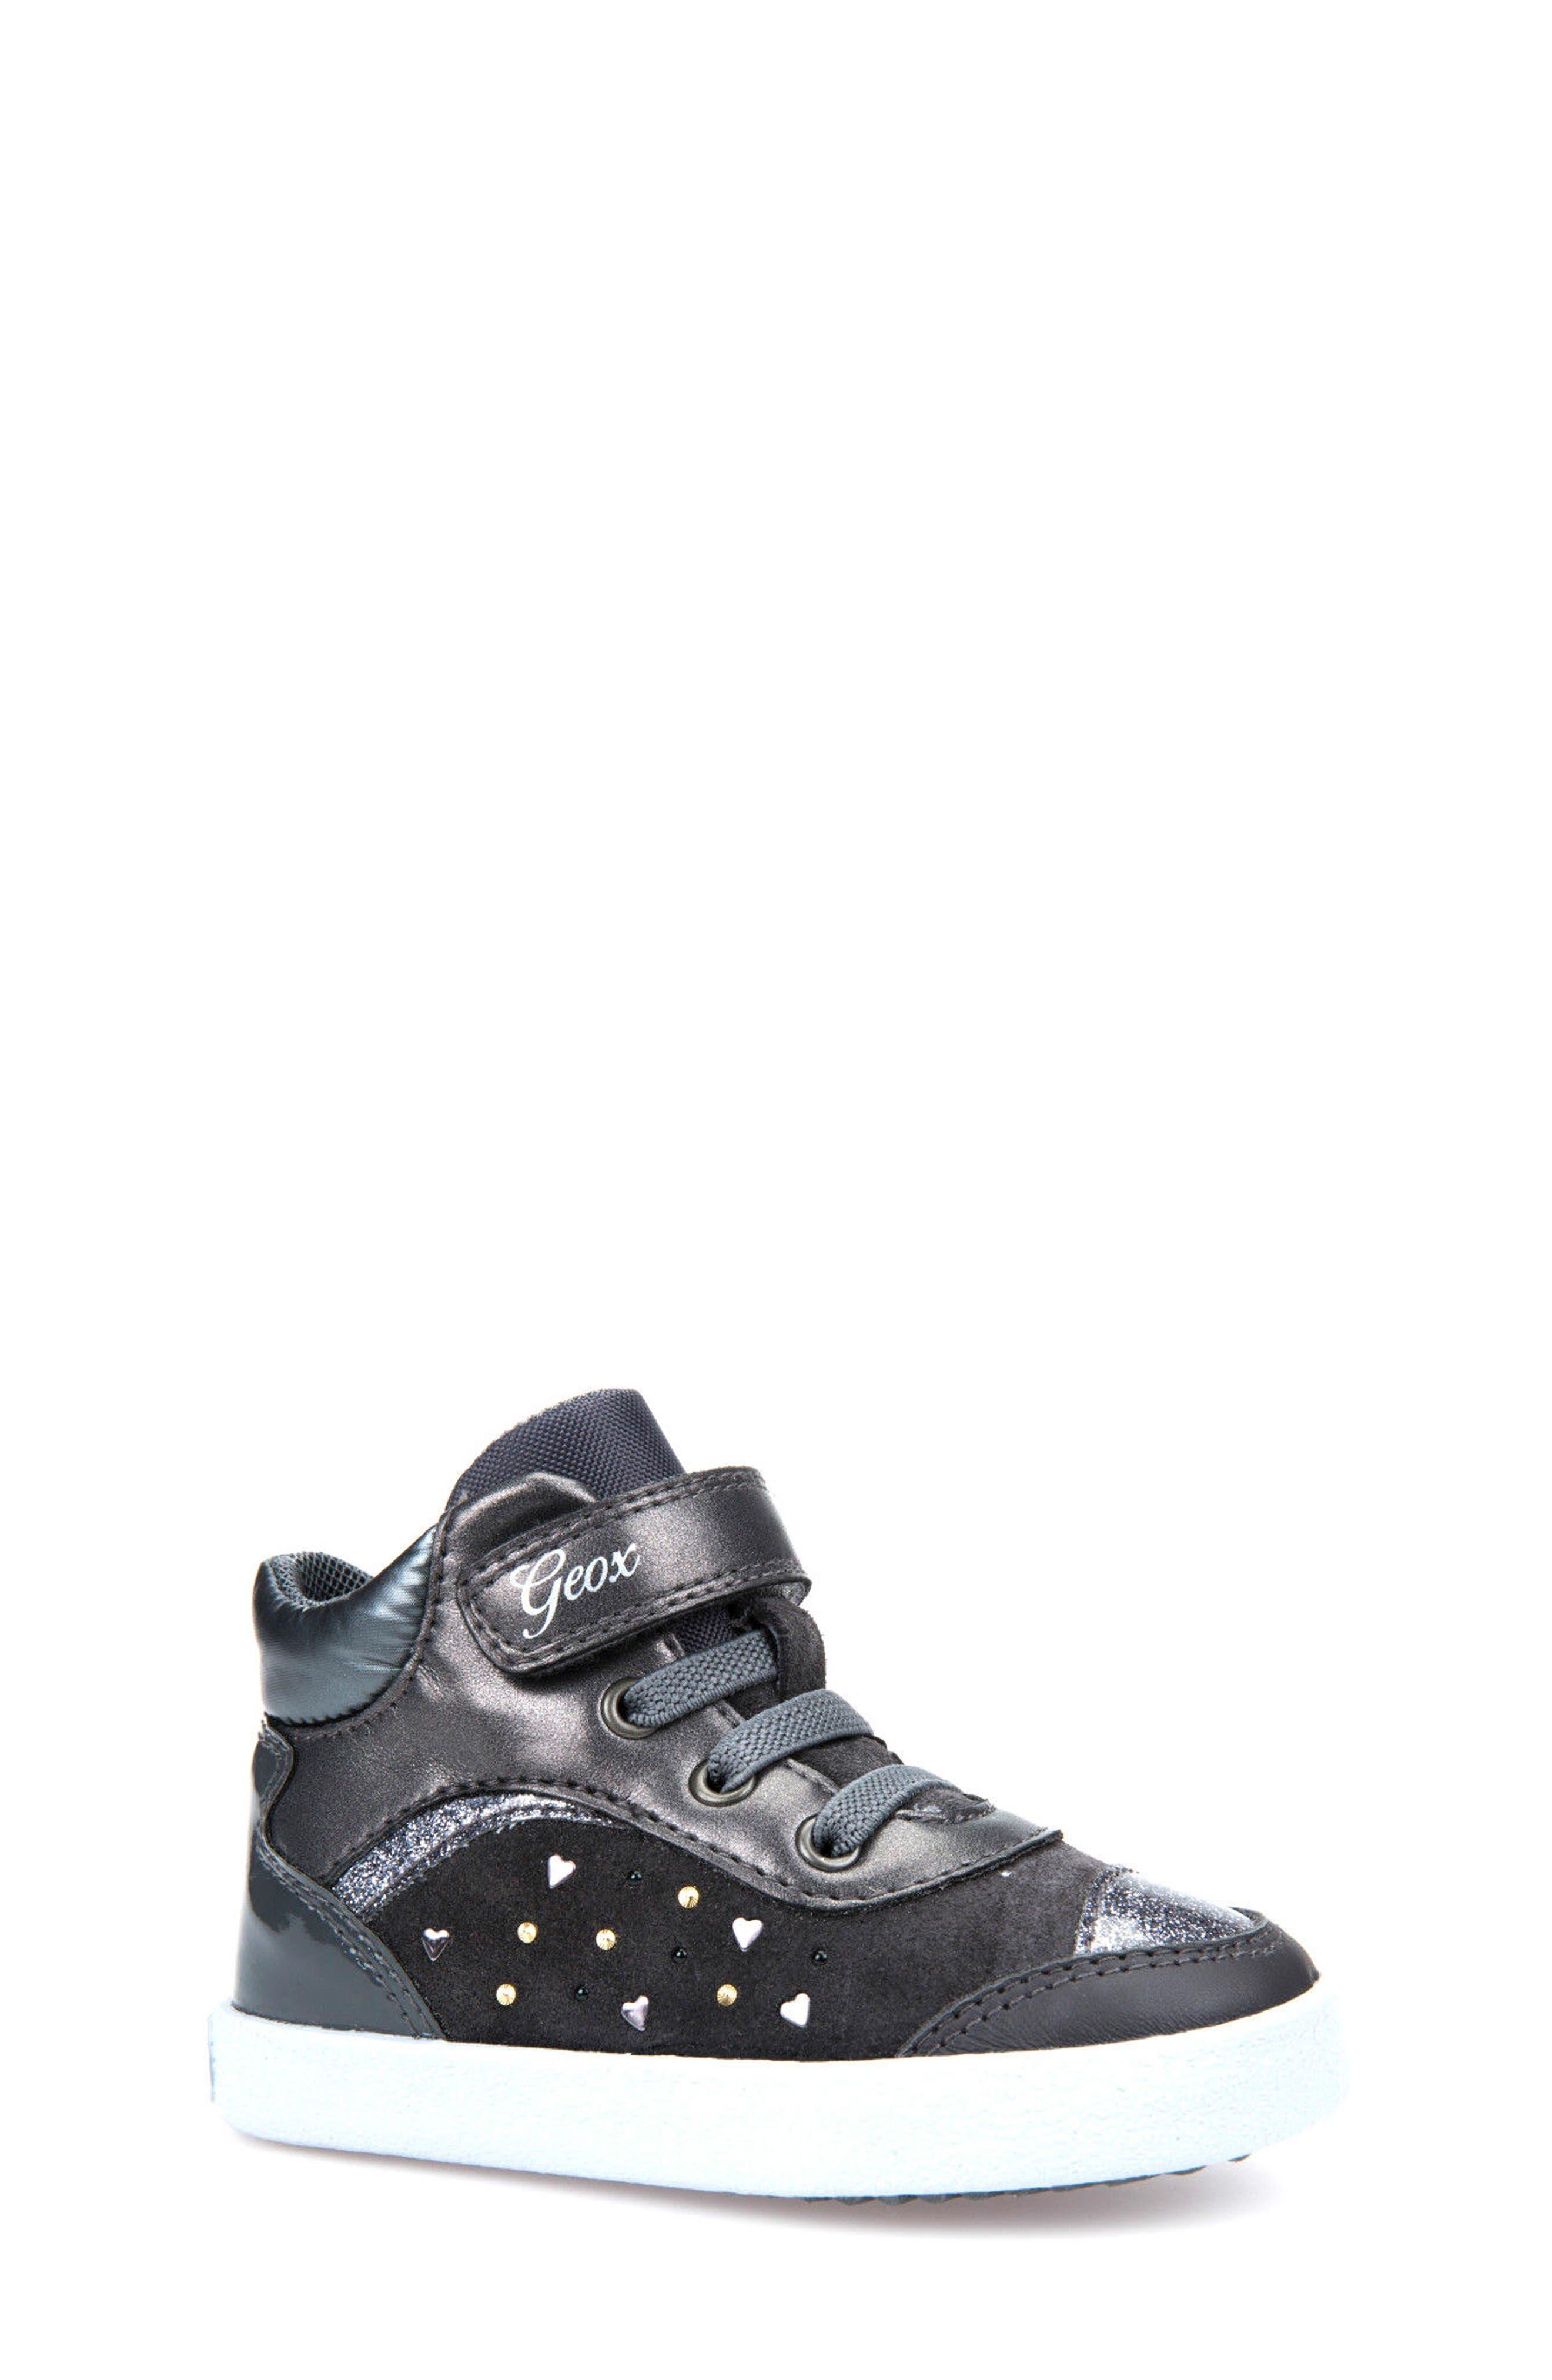 Geox Kiwi Girl Studded High Top Sneaker (Walker & Toddler)